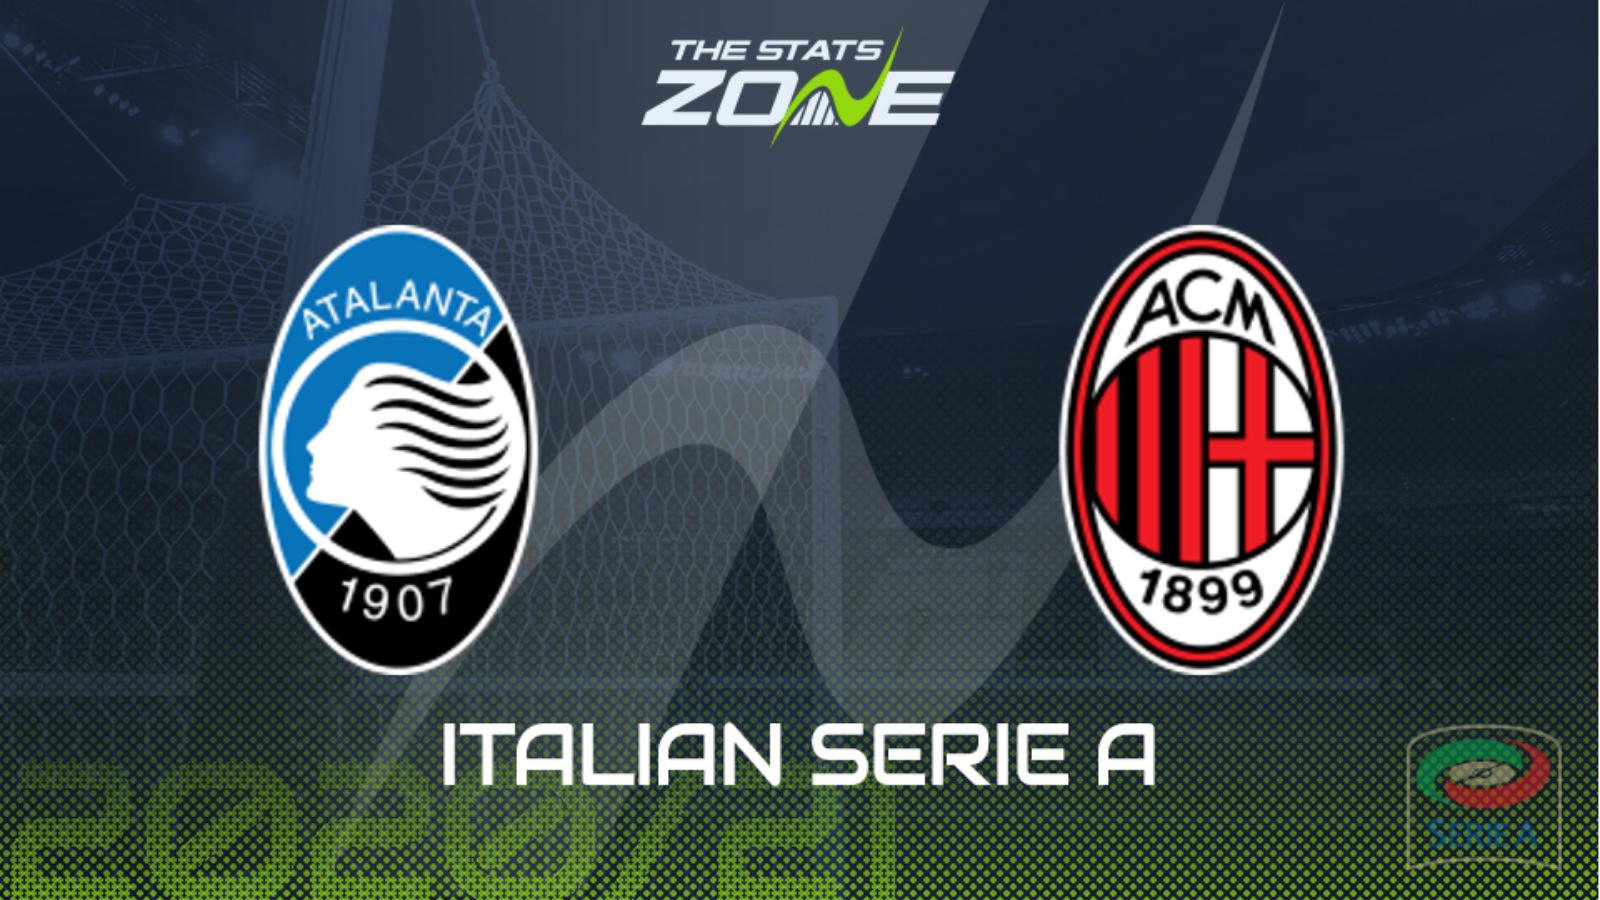 Atalanta vs AC Milan Full Match – Serie A 2020/21